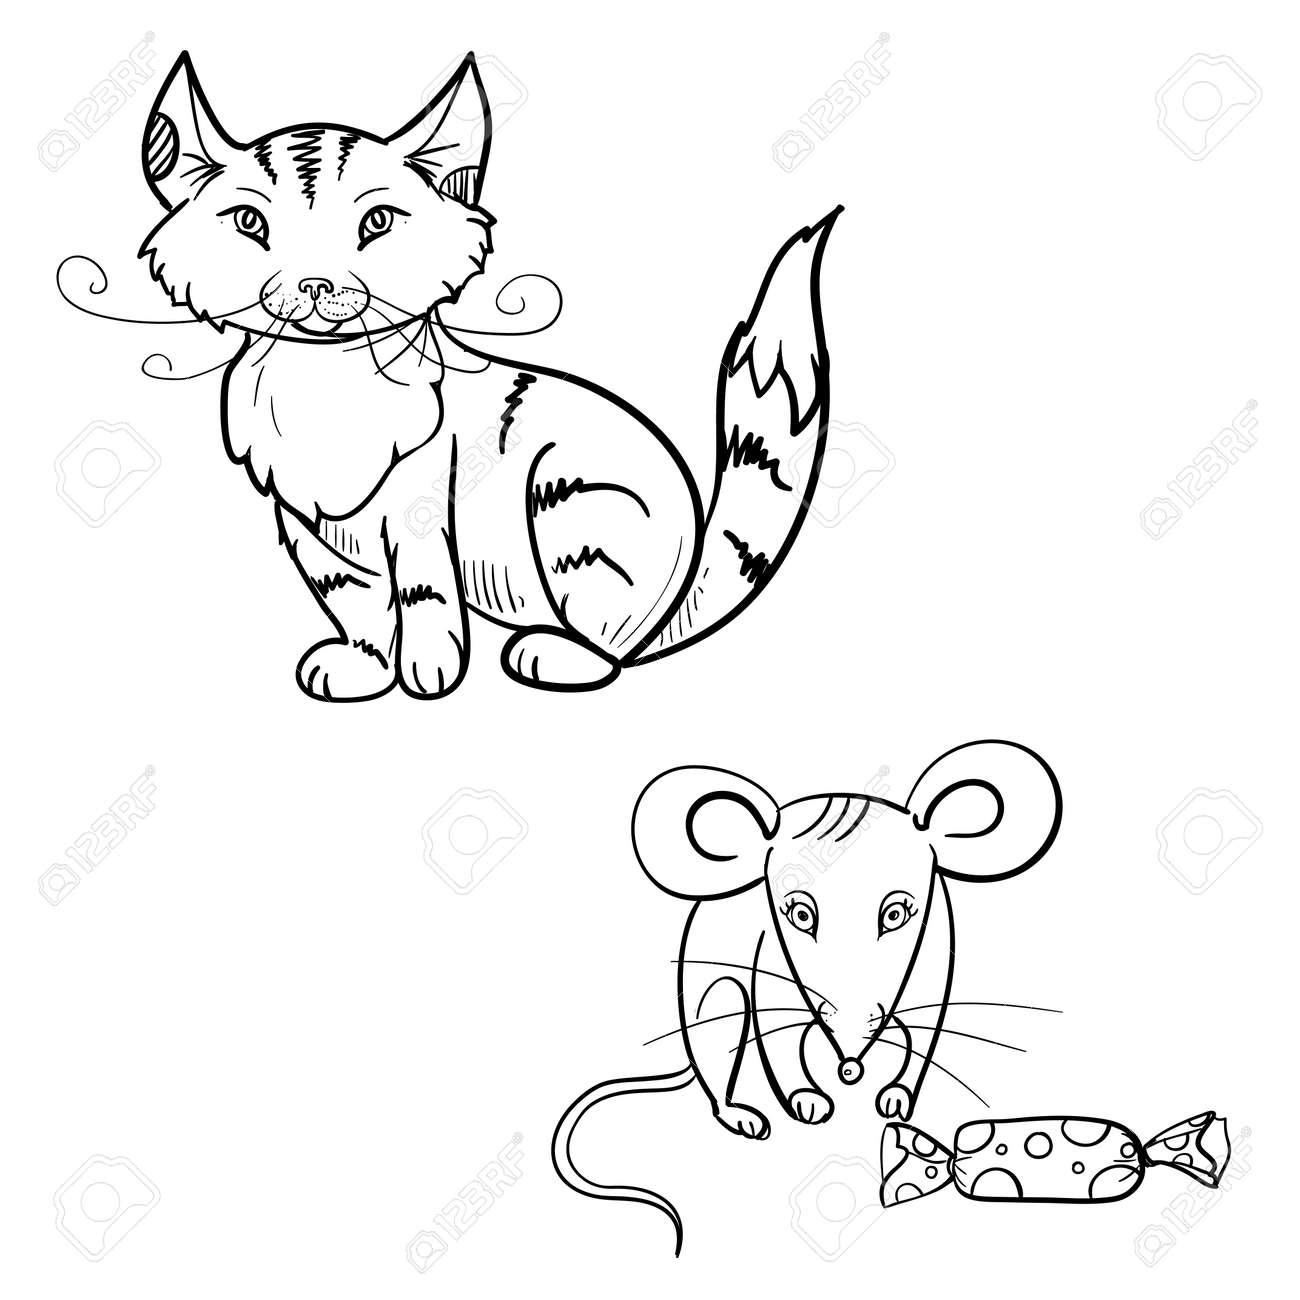 Dibujado A Mano Para Colorear Para Niños Vector De Gato, Ratón Con ...